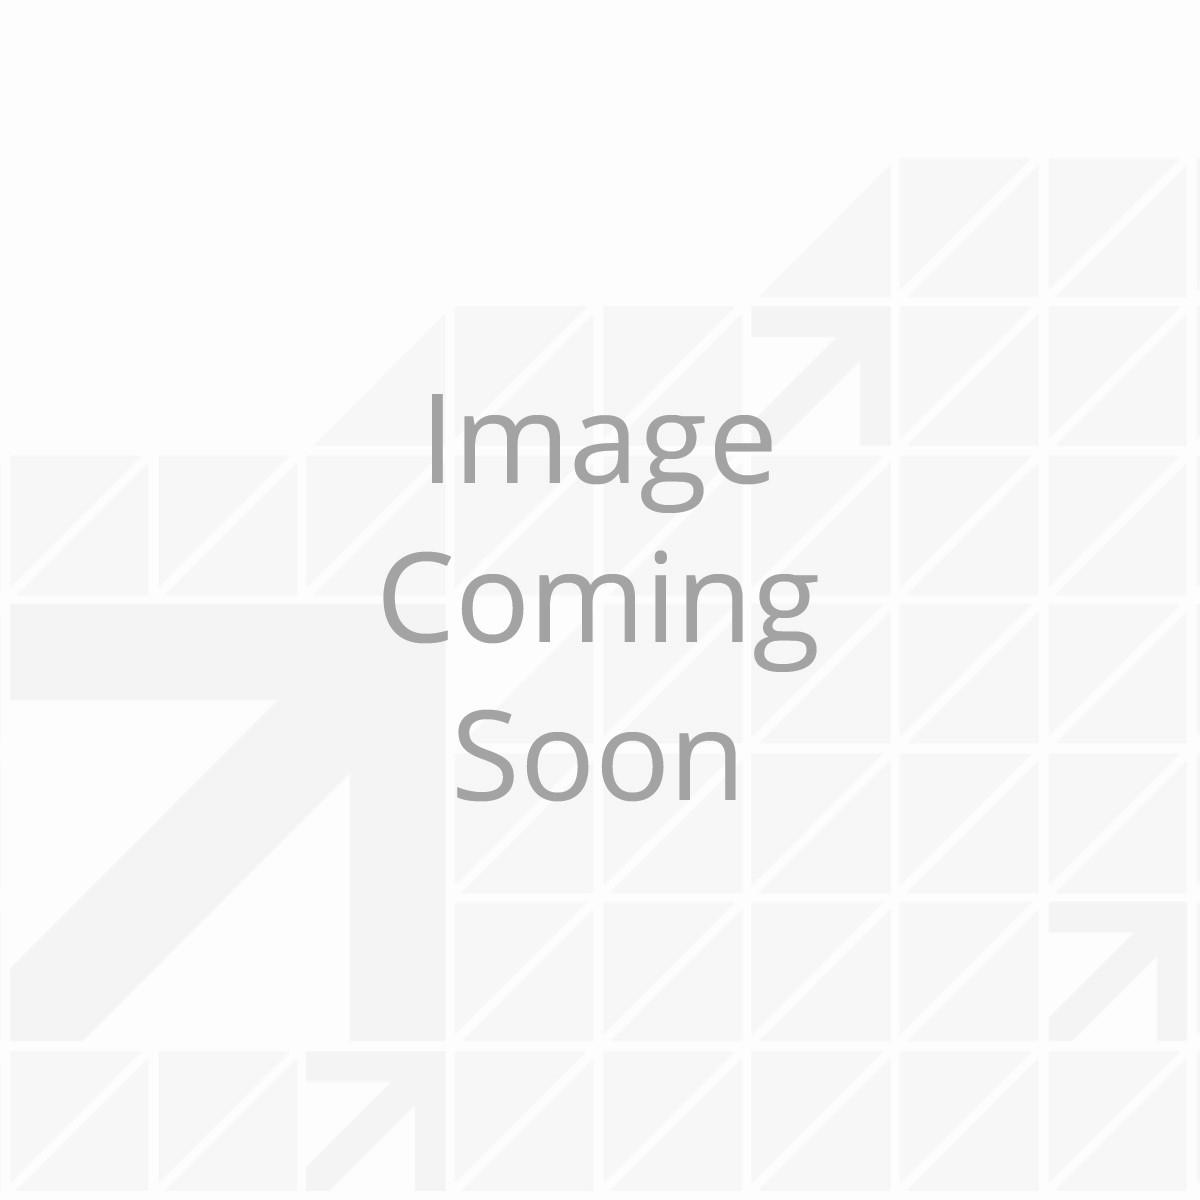 Insulation Grommet 11/16 1-5/16od X 1/16gr